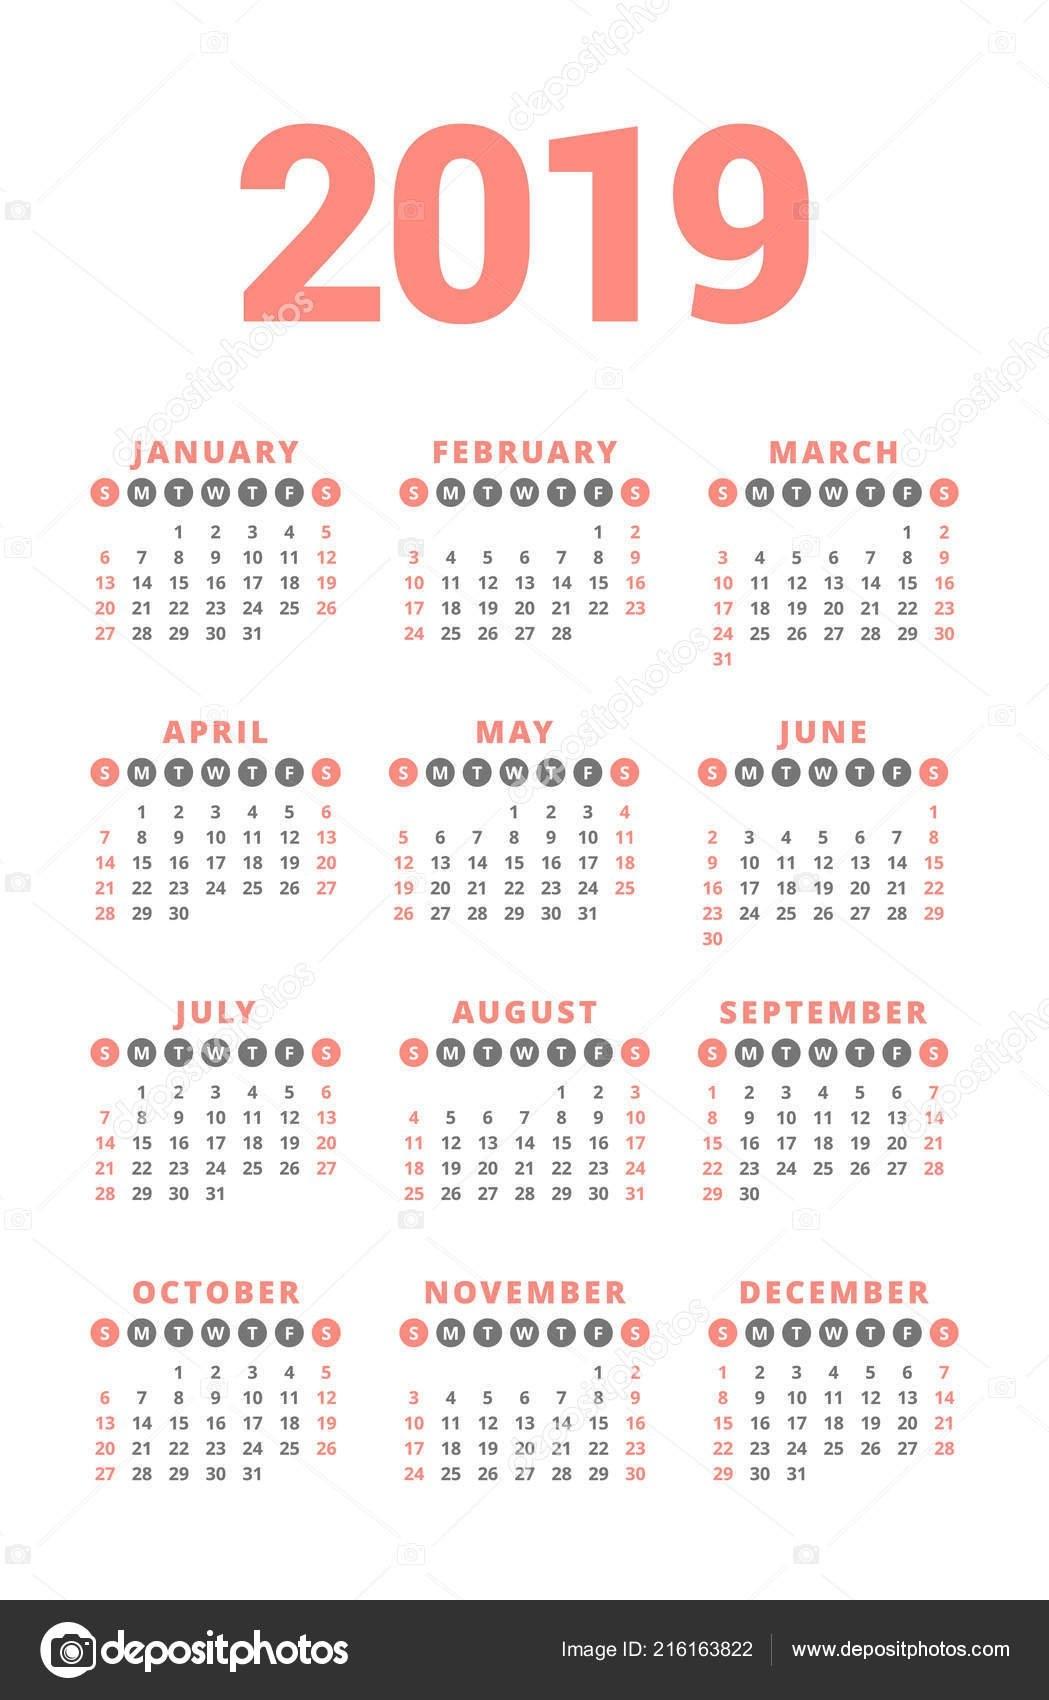 Calendar 2019 Year White Background Week Starts Sunday Columns Rows Calendar 2019 3 Columns